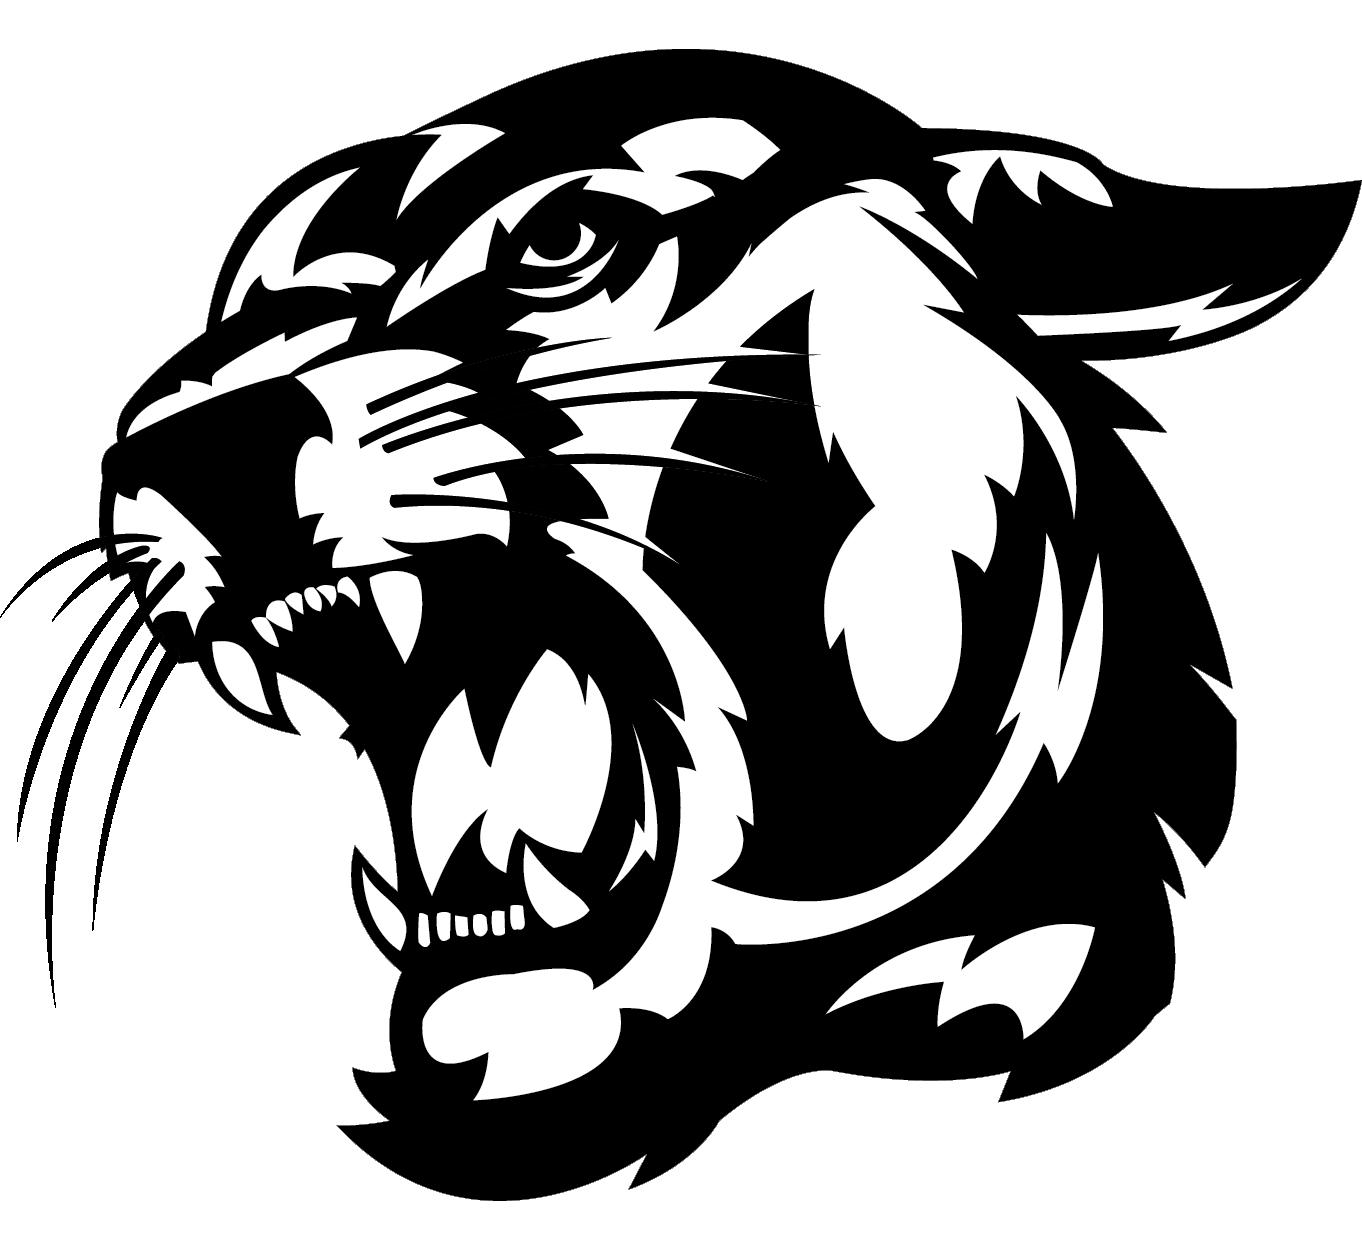 Panther clipart track. Znalezione obrazy dla zapytania